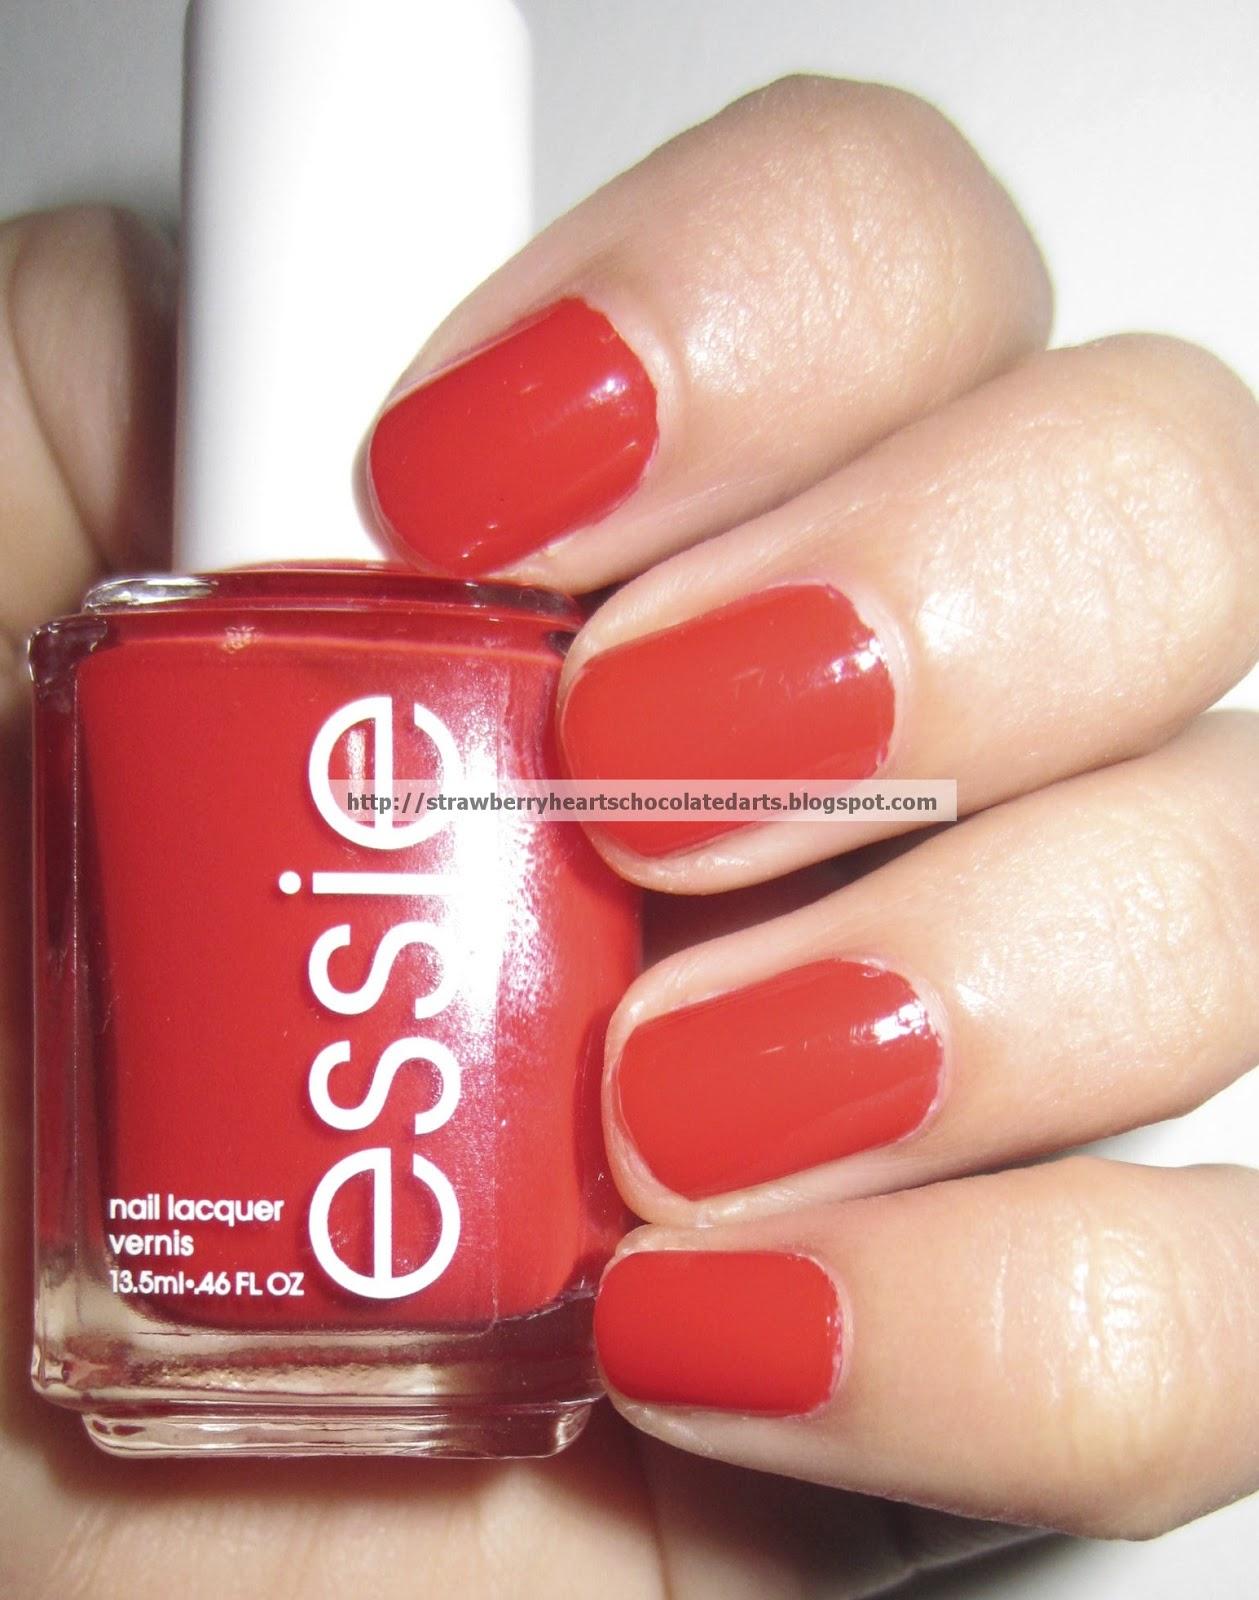 Strawberry Hearts Chocolate Darts: Essie Nail Polishes: No More Film ...